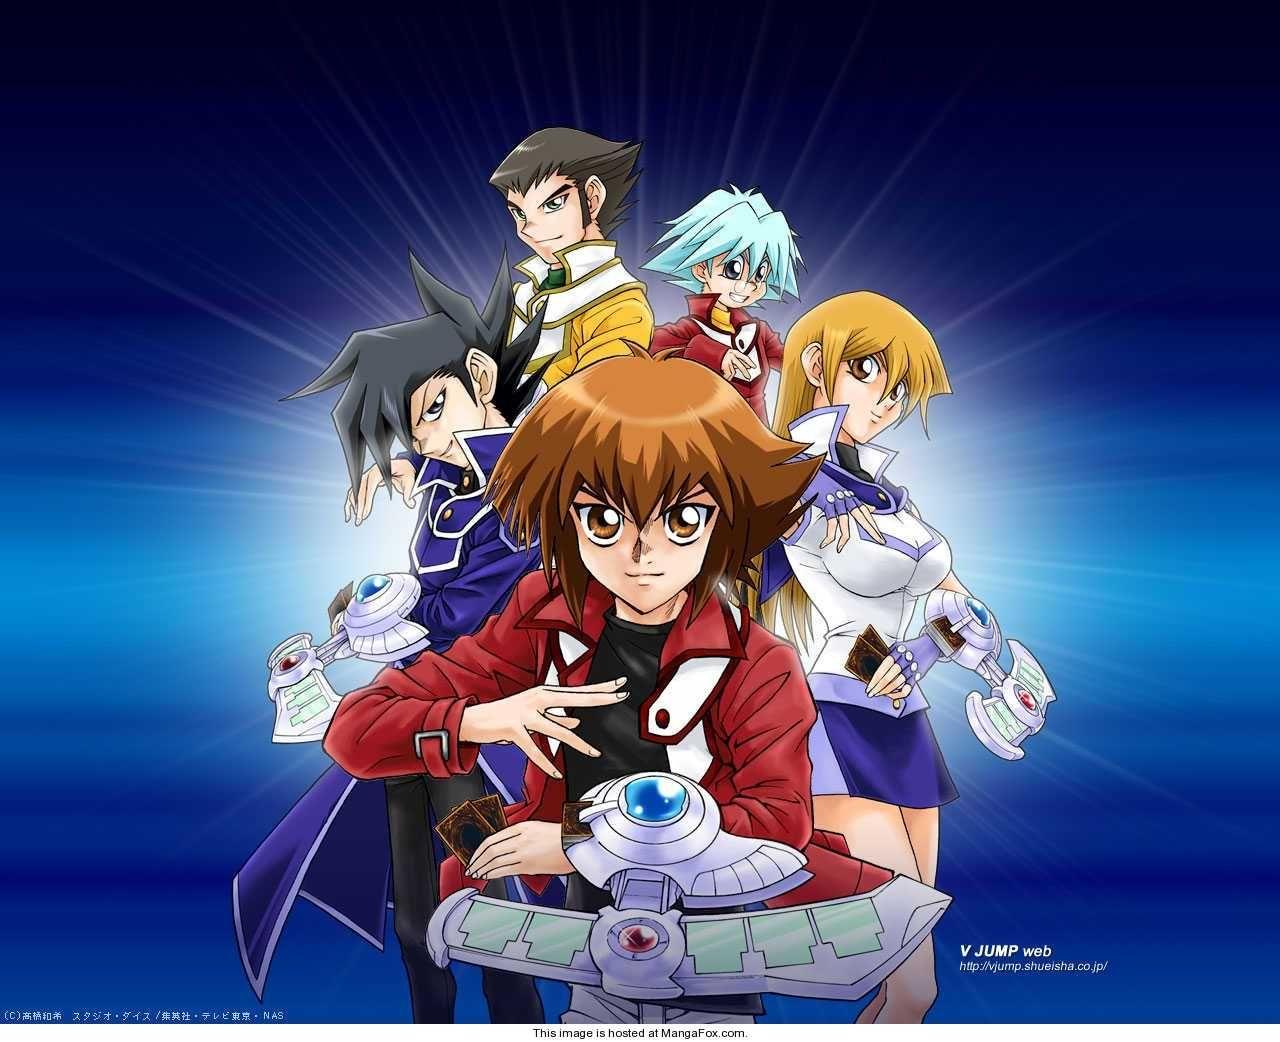 Los Mejores 21 Papeis De Parede Yu Gi Oh Gx Taringa Yugioh Anime Anime Shows